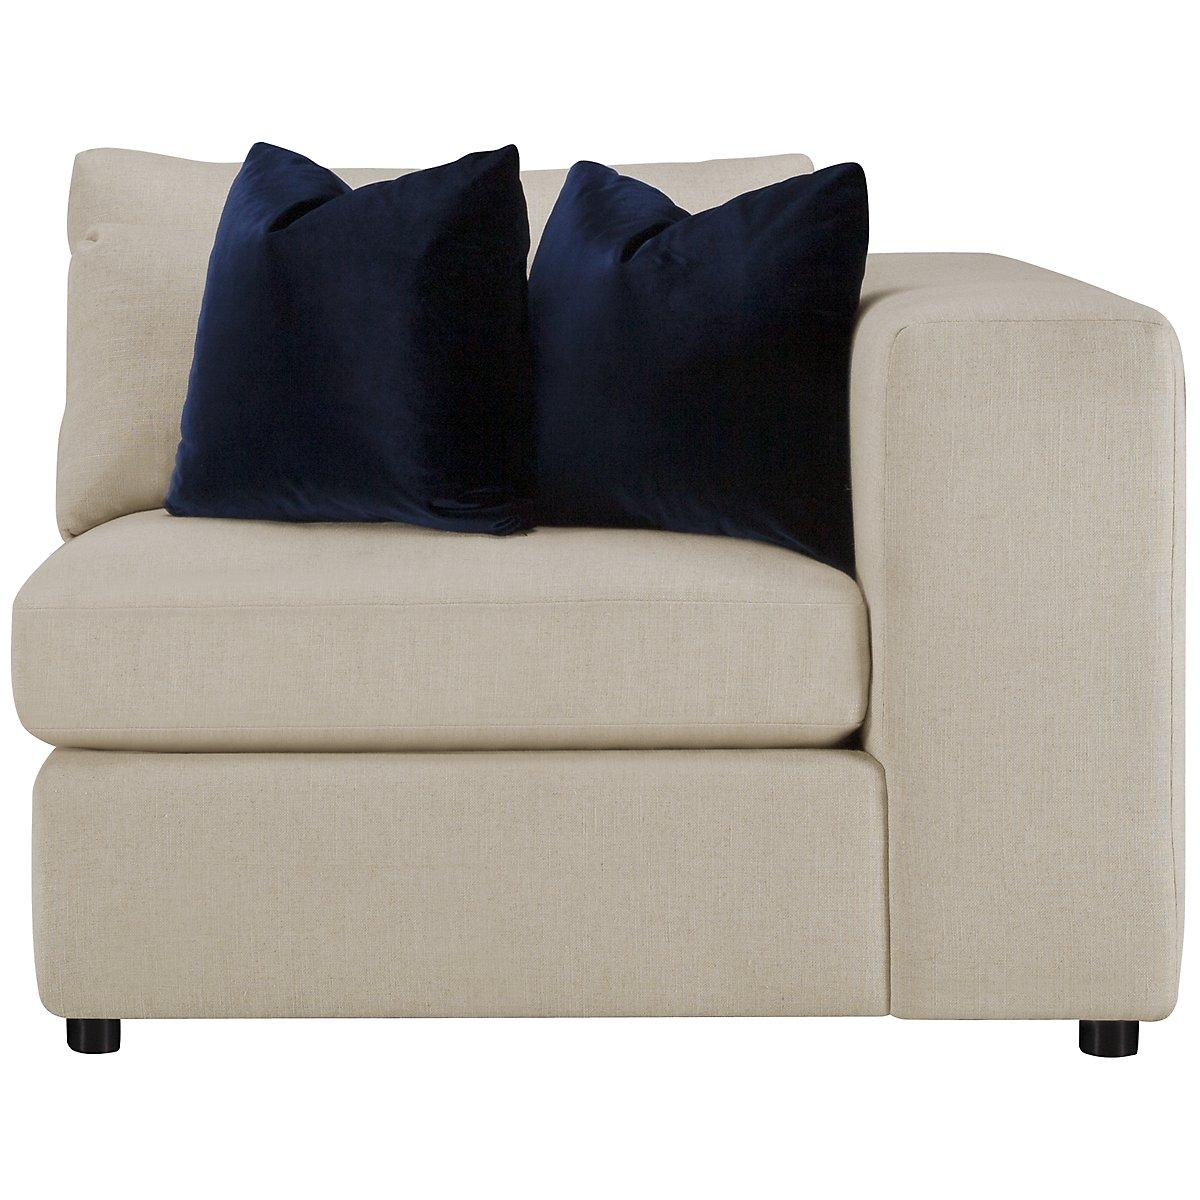 city furniture como lt beige fabric large sofa. Black Bedroom Furniture Sets. Home Design Ideas